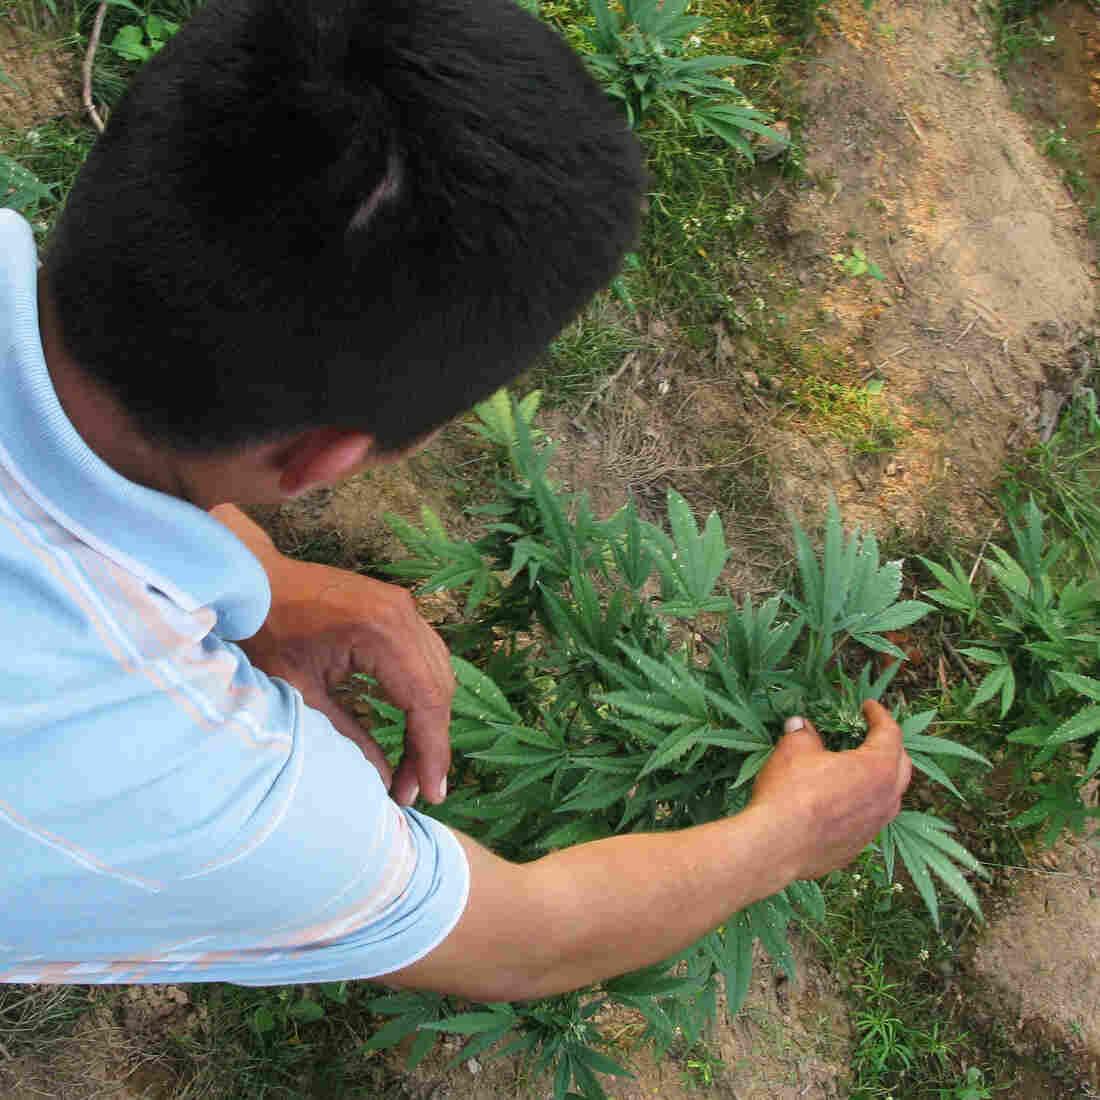 Legal Pot In The U.S. May Be Undercutting Mexican Marijuana